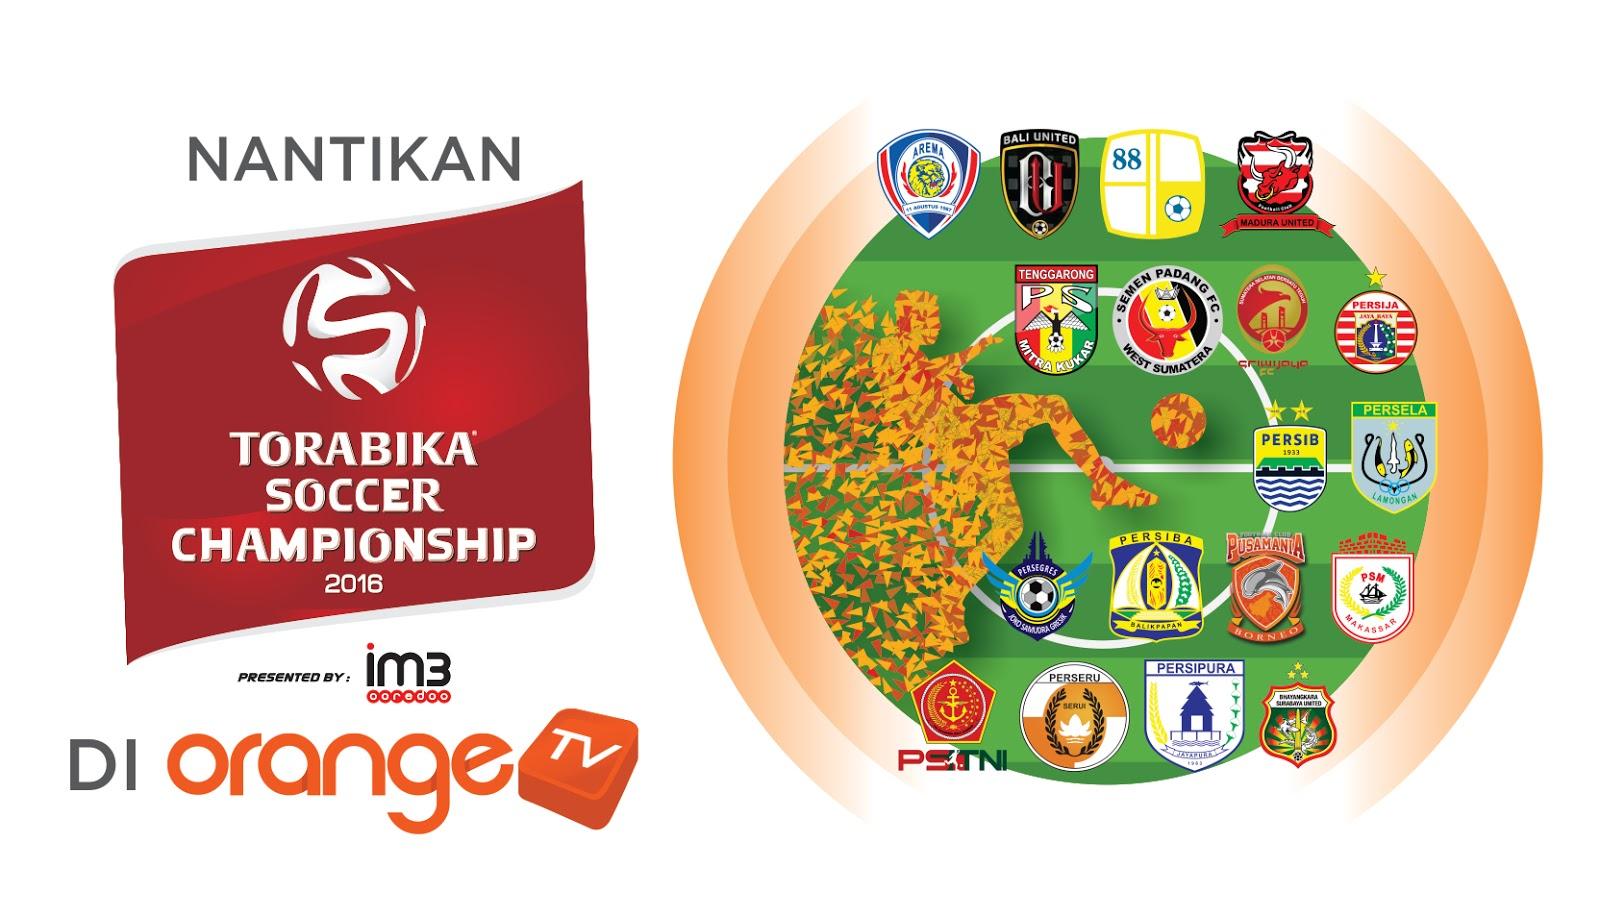 OrangeKU Torabika Soccer Championship Orange TV